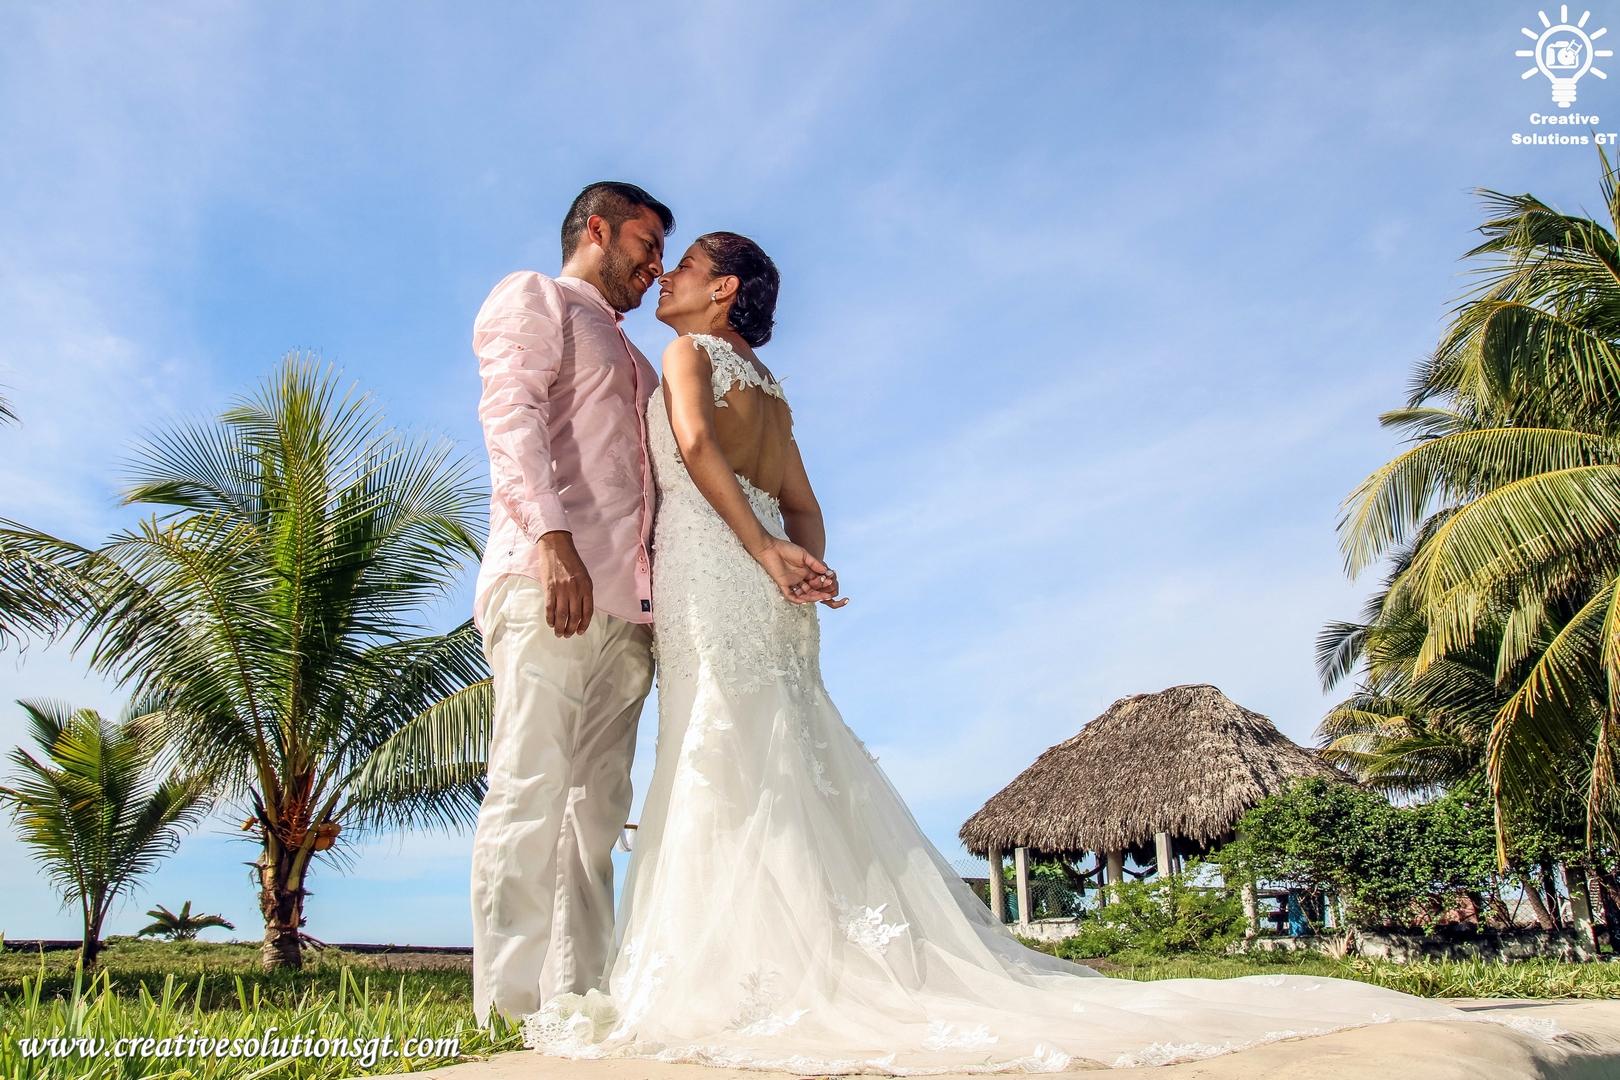 servicio de fotografo para bodas en guatemala (4)